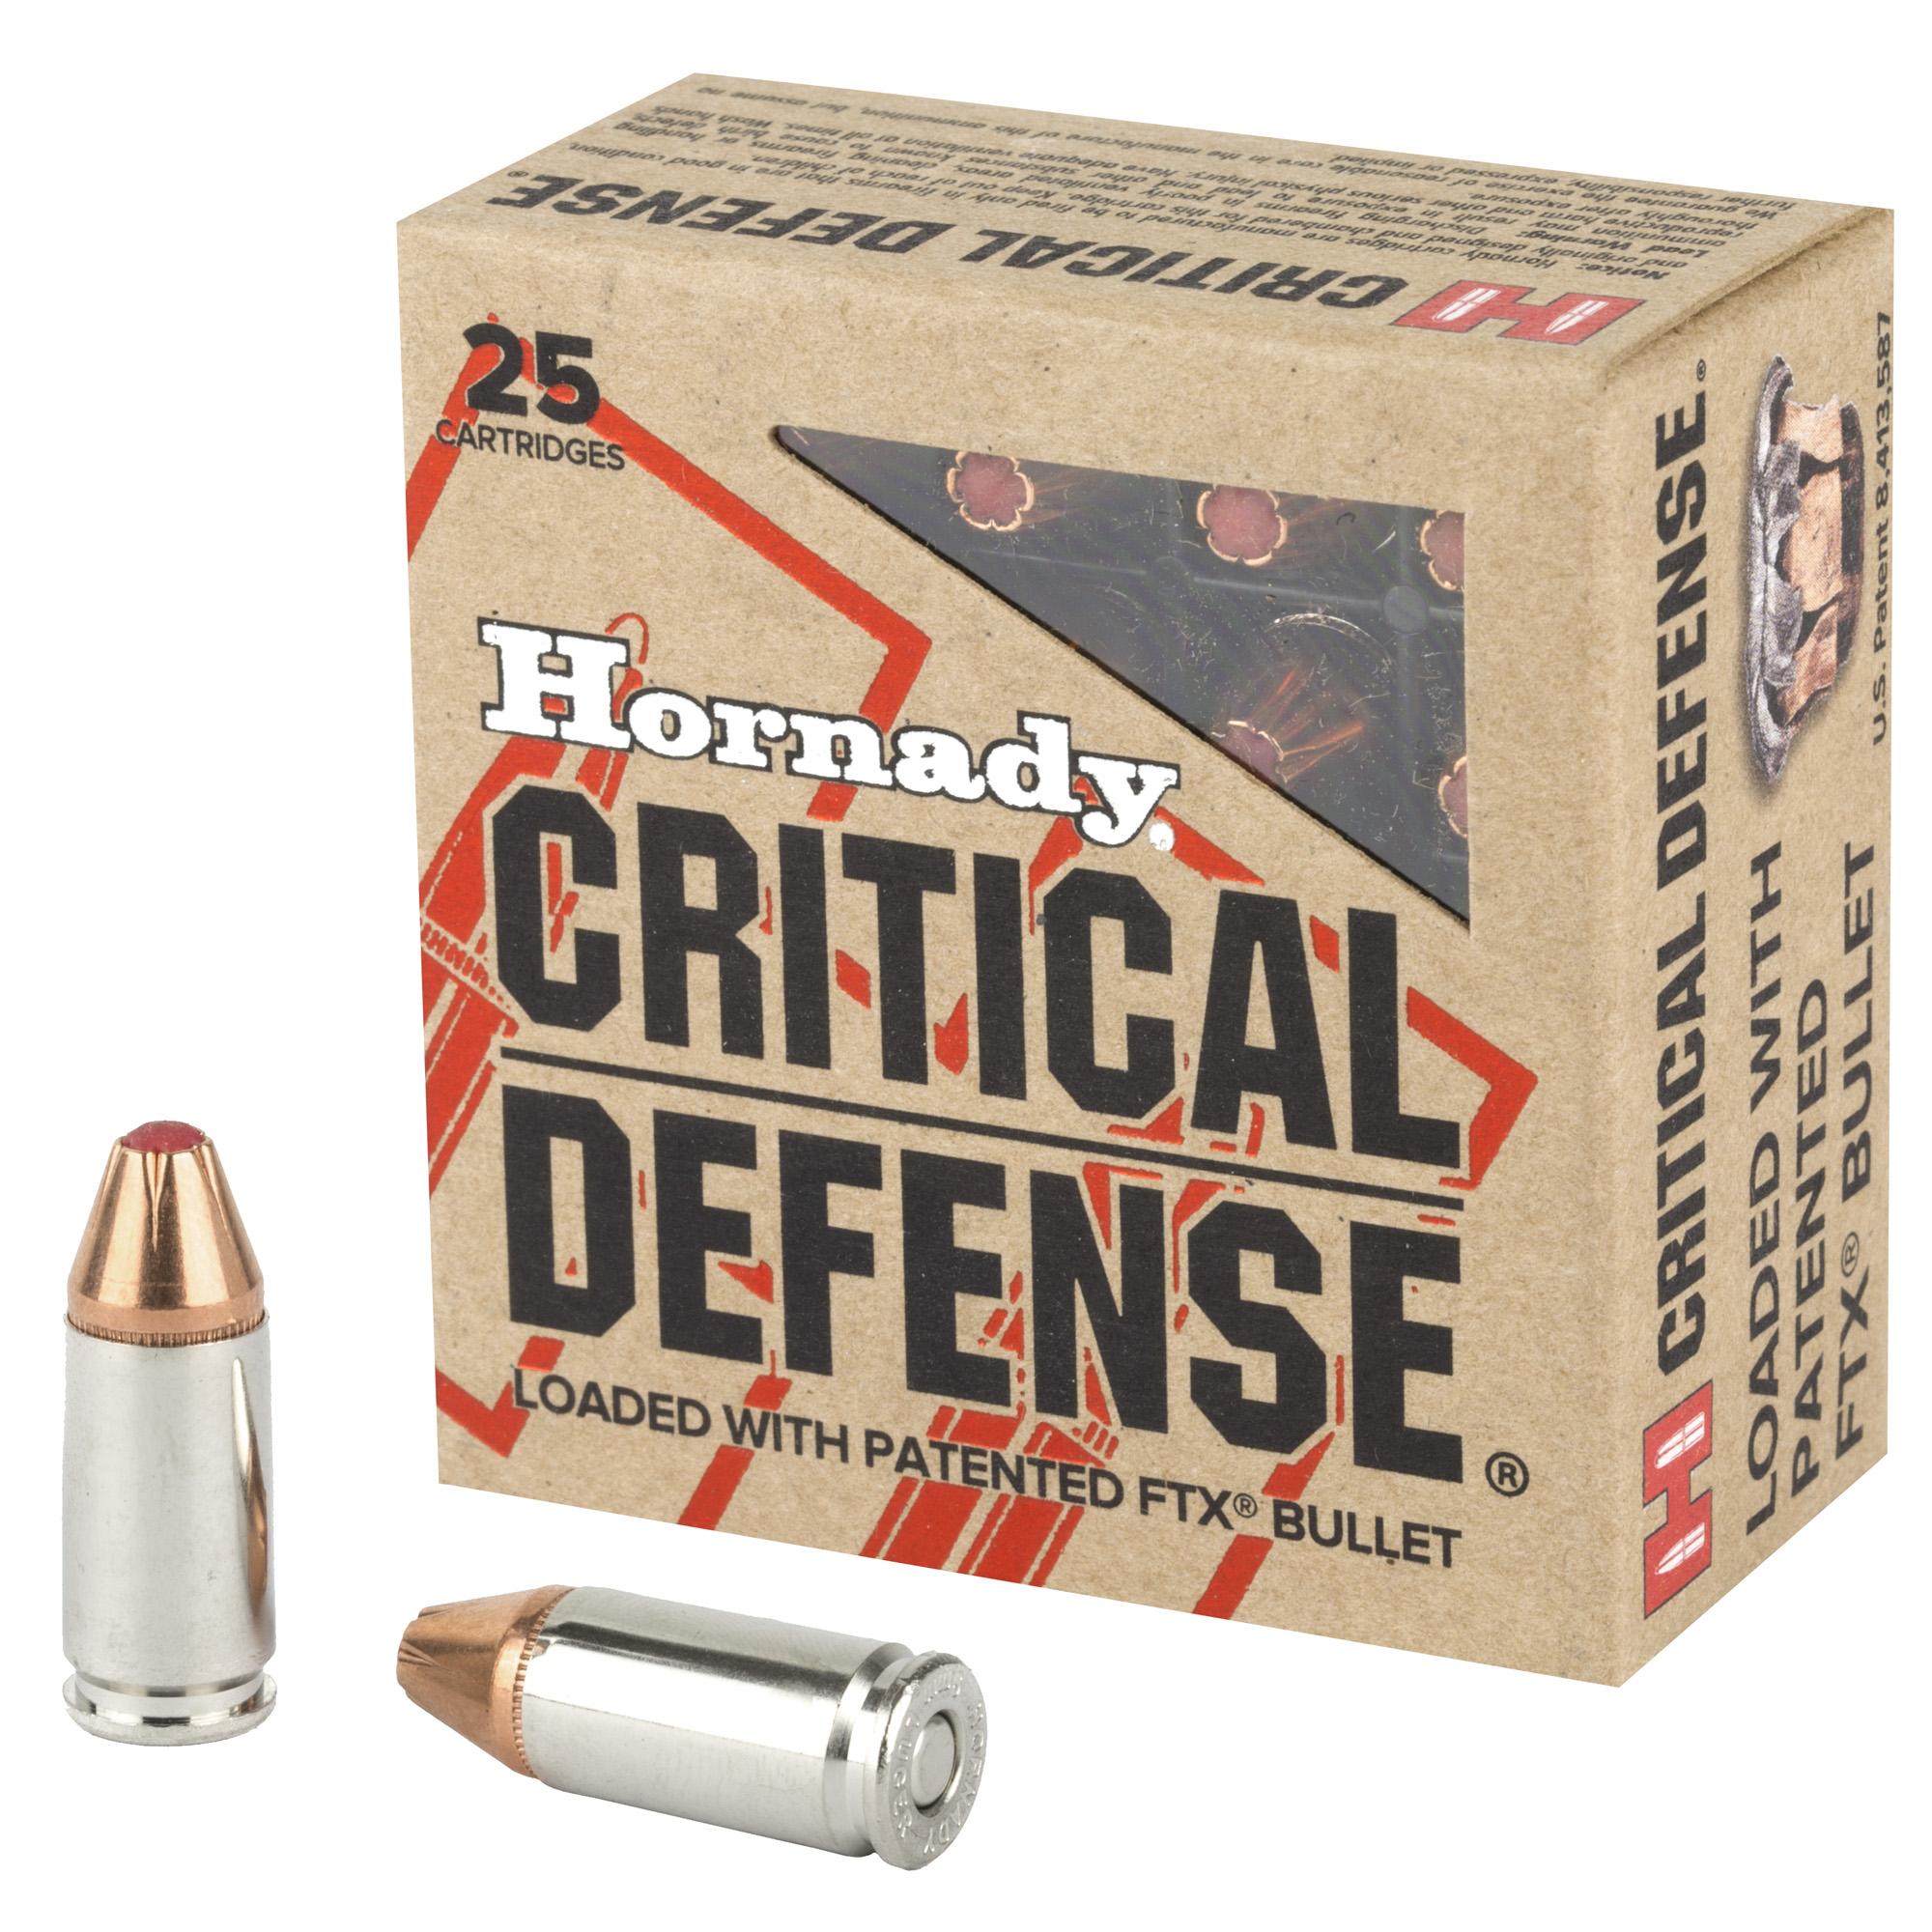 Hornady Critical Defense 9mm Ammunition 115gr FTX, 25Rd Box